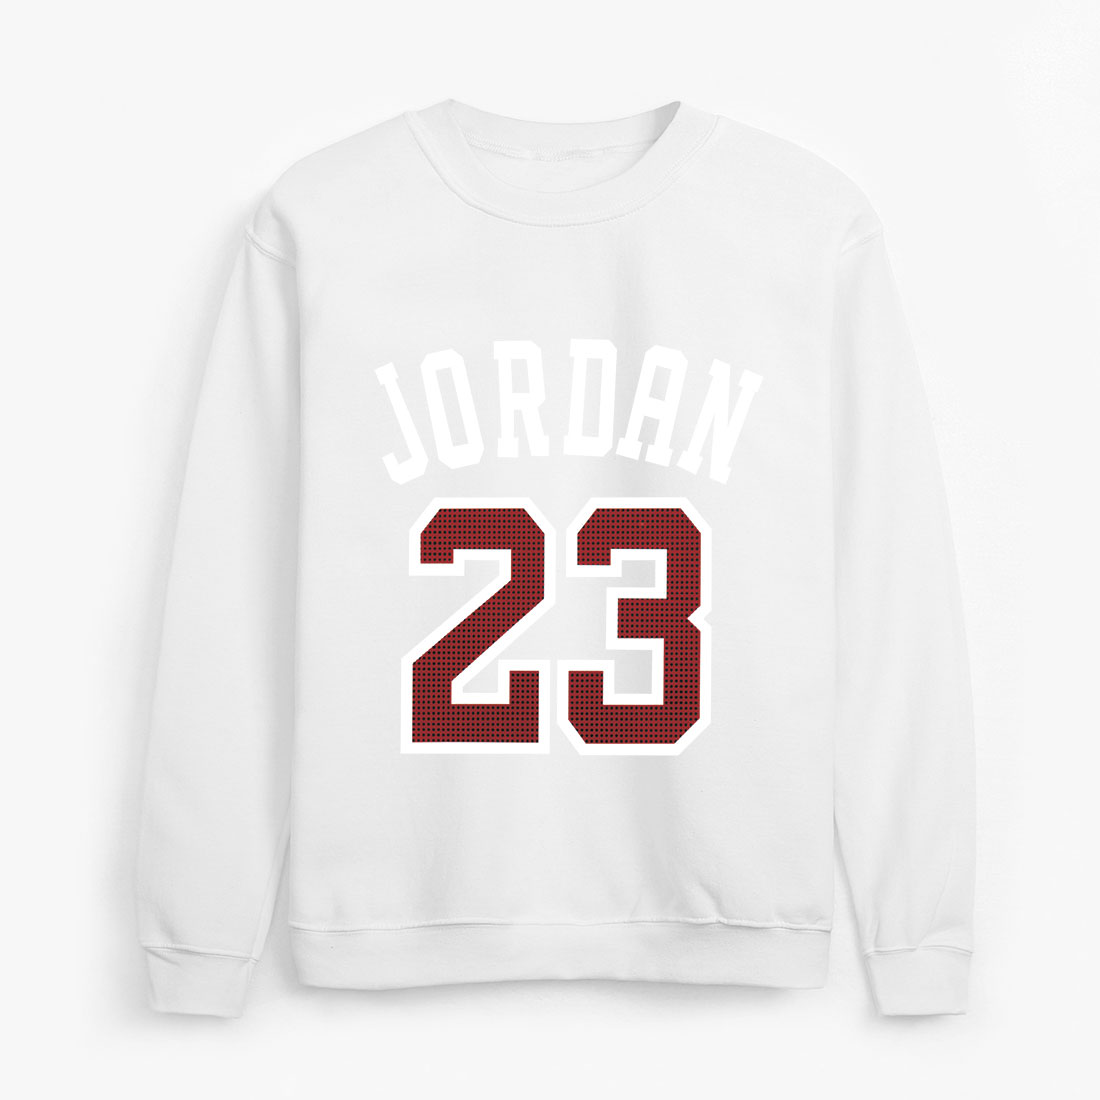 Hoodies Men Hooded Autumn Printed Jordan 23 Letter Printing Men's Sweatshirt Loose Hip Hop Solid Color Simplicity Clothes Tops